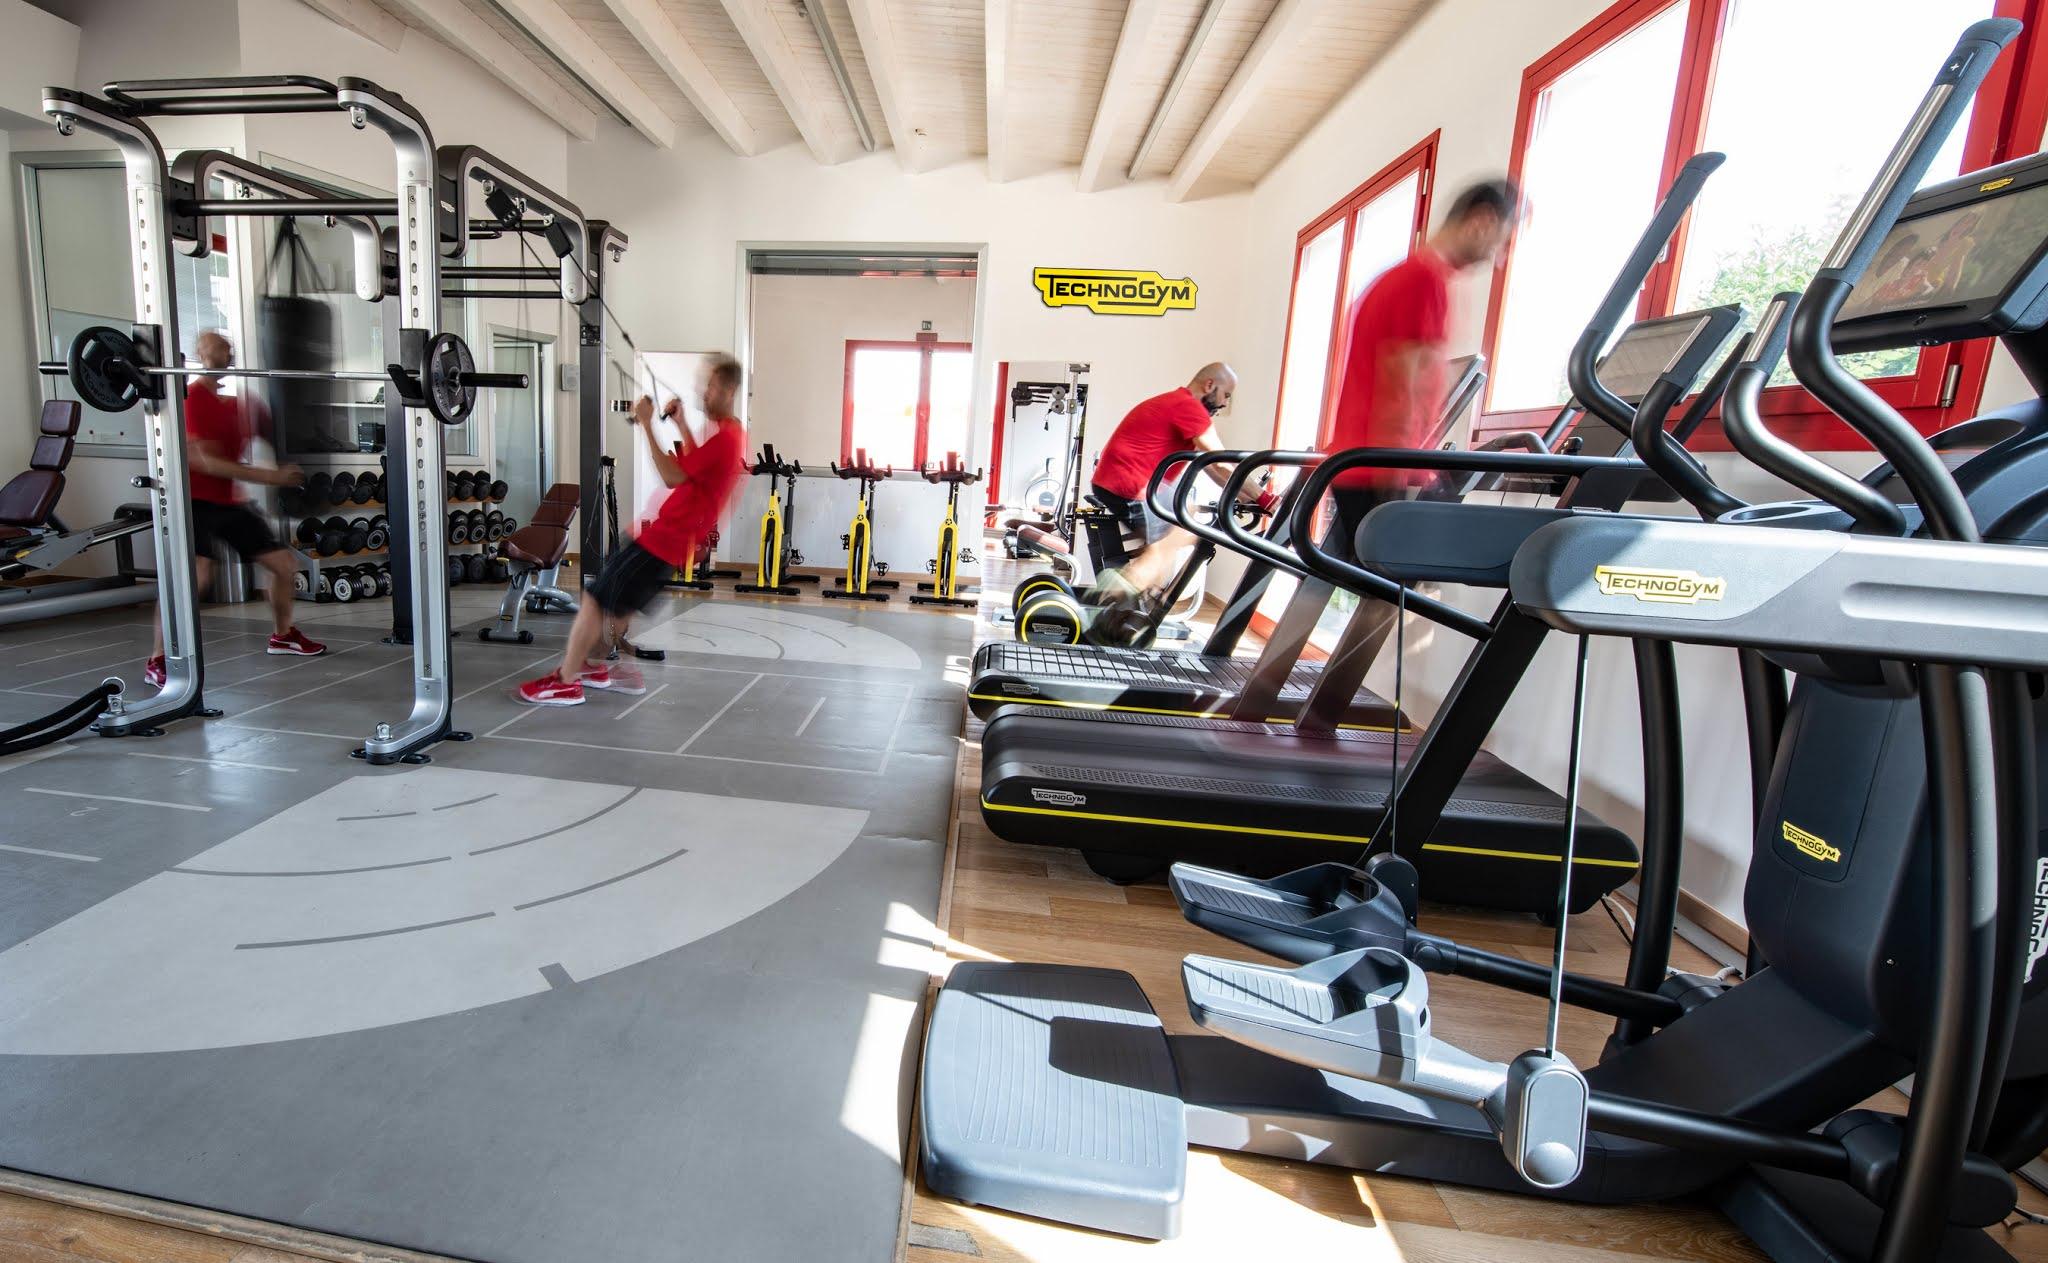 Scuderia Ferrari stays fit with Technogym